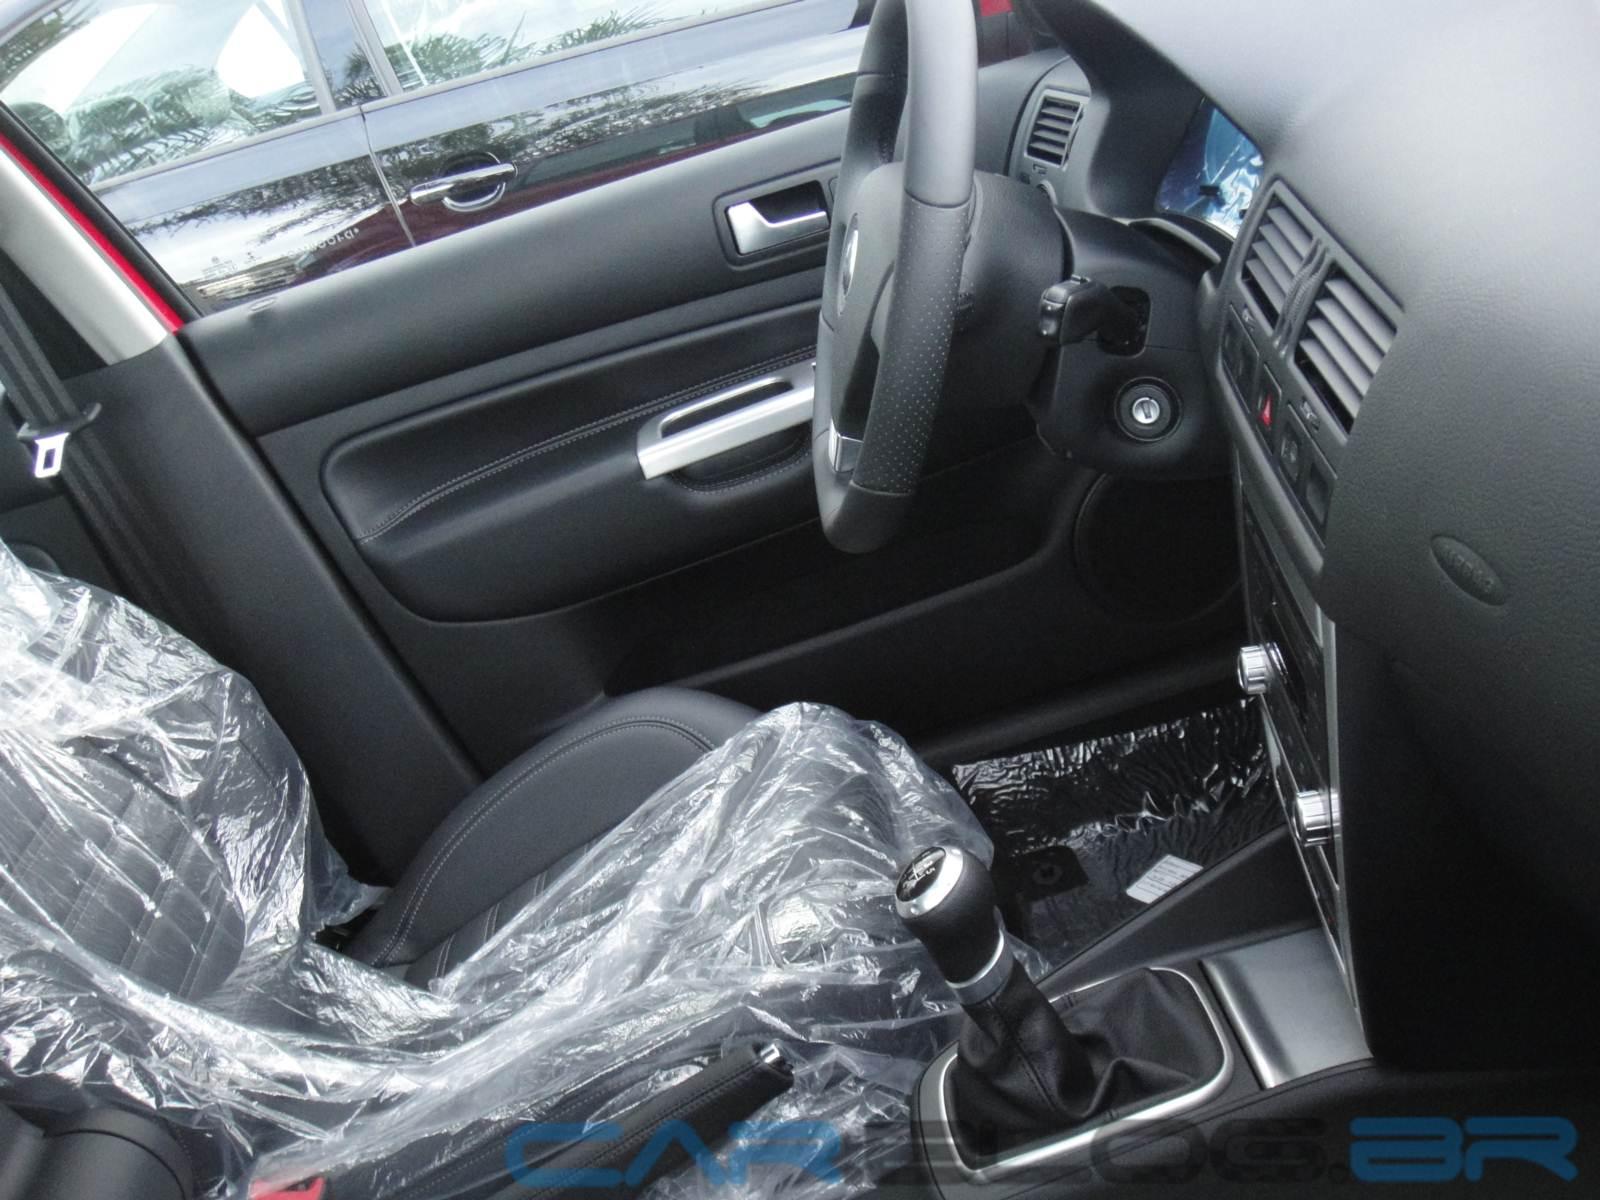 VW Golf Sportline 2014 - interior